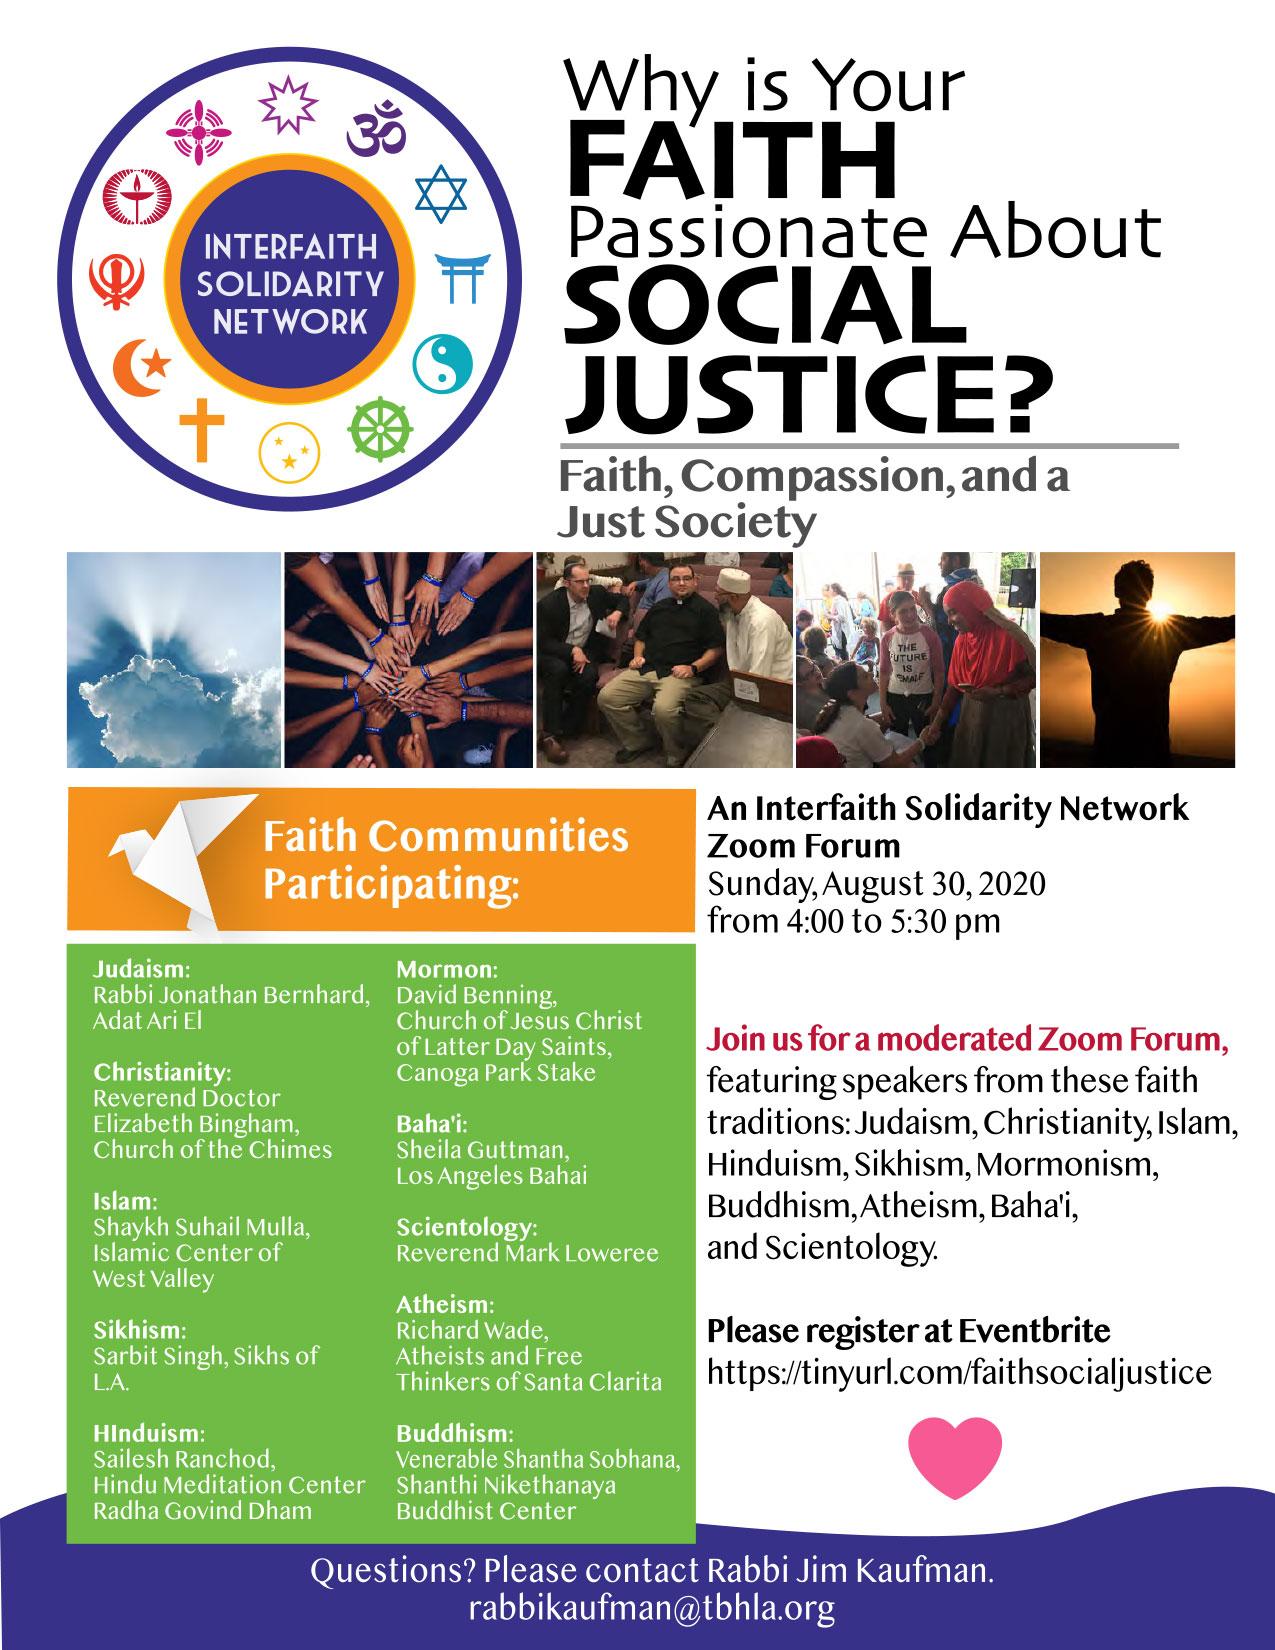 ISN-Why-Faith-Does-Social-Justice